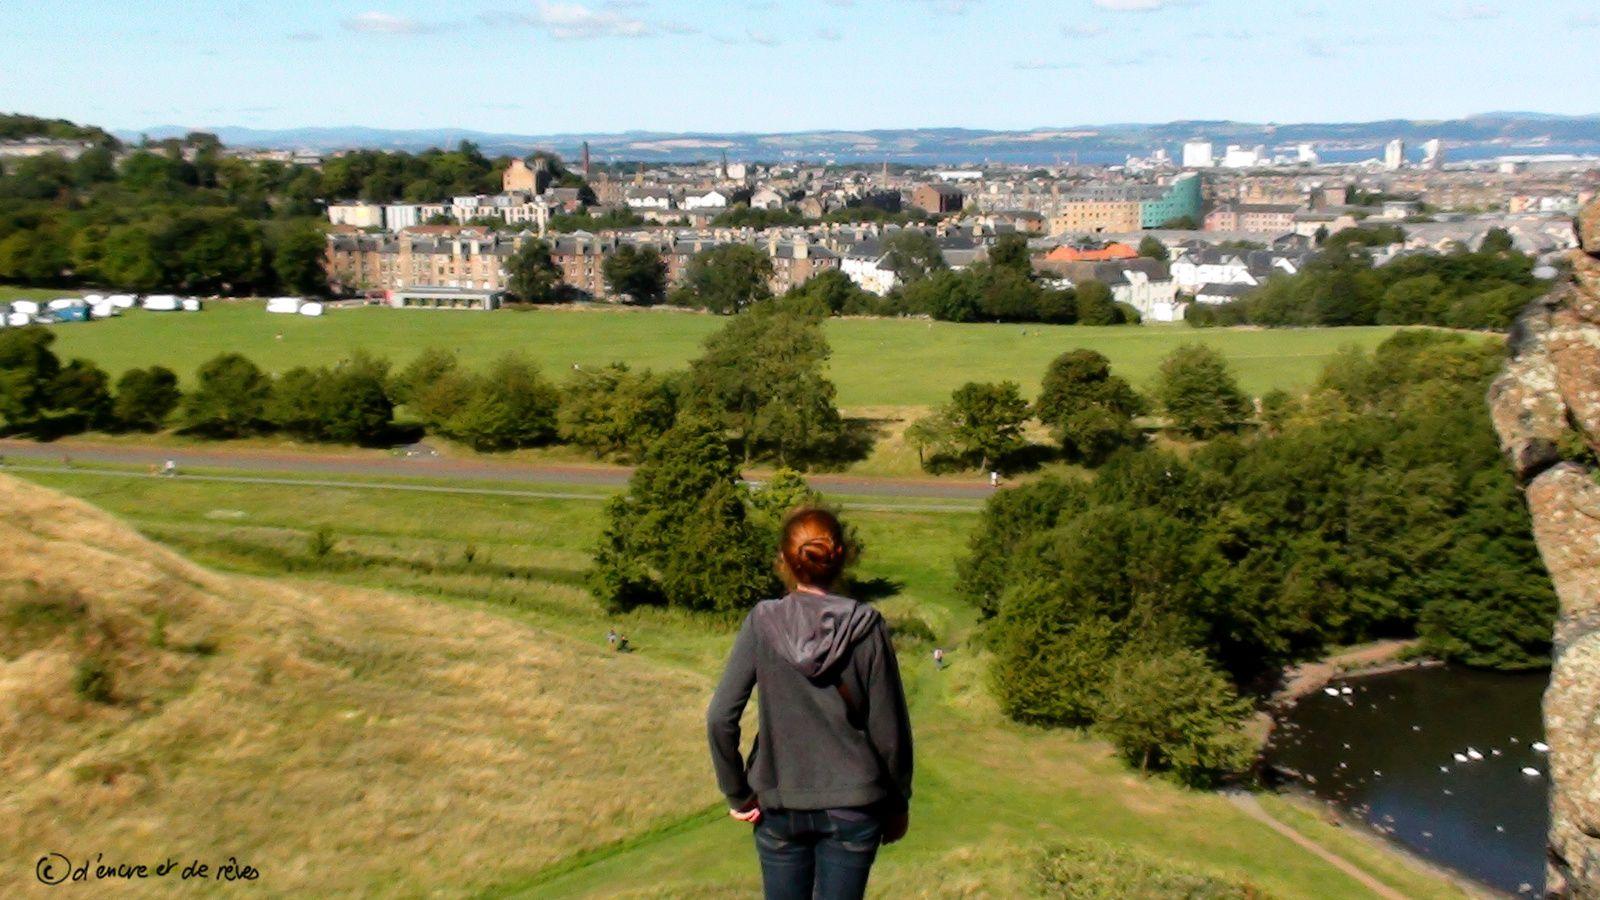 Balade Littéraire #12 : Arthur's Seat - Edimbourg (Ecosse) + VIDEO